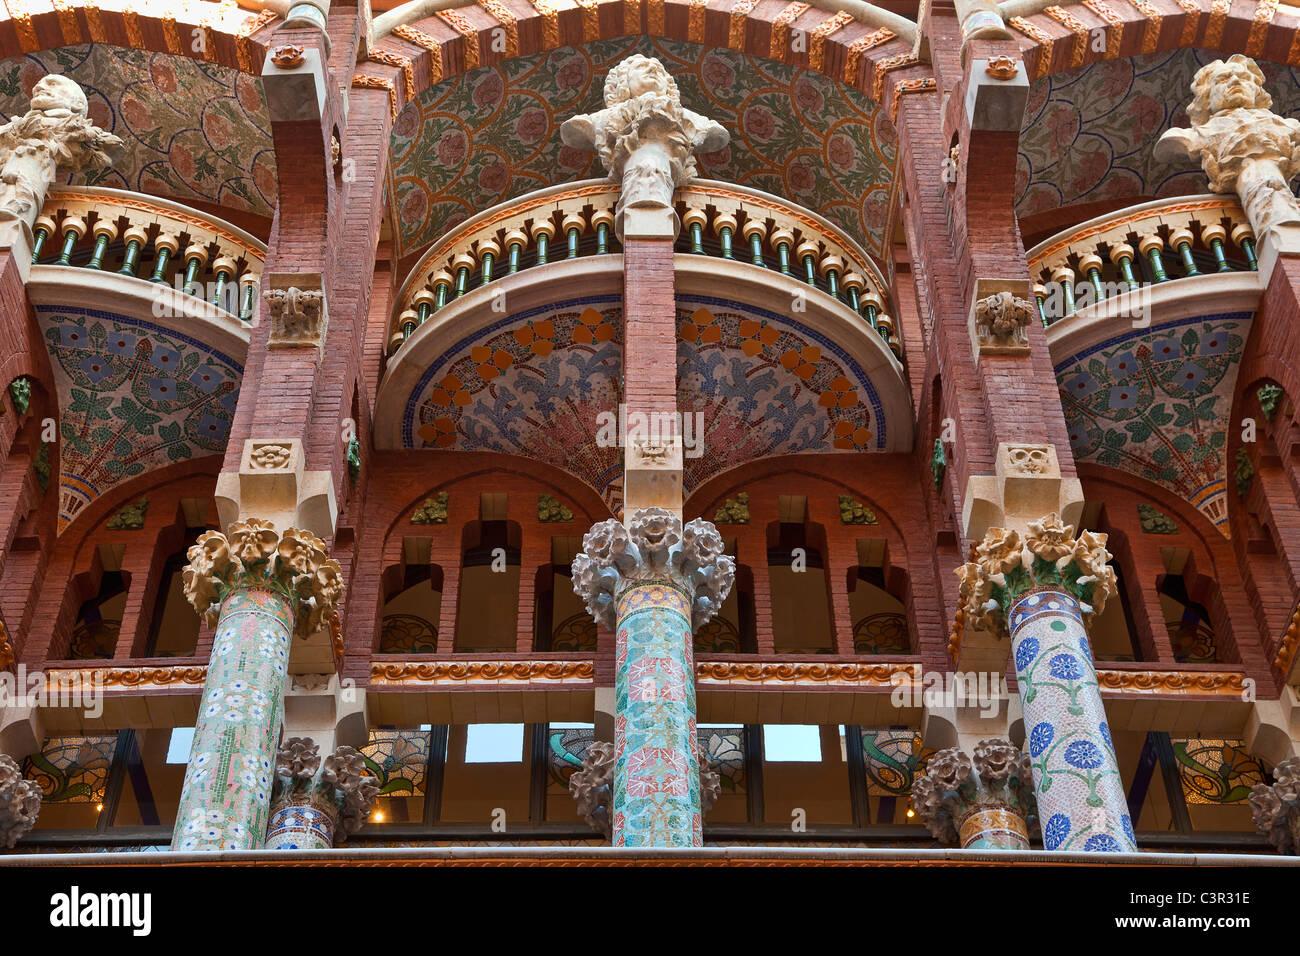 Barcelona, escultura arquitectónica decorando Palau de la música Imagen De Stock